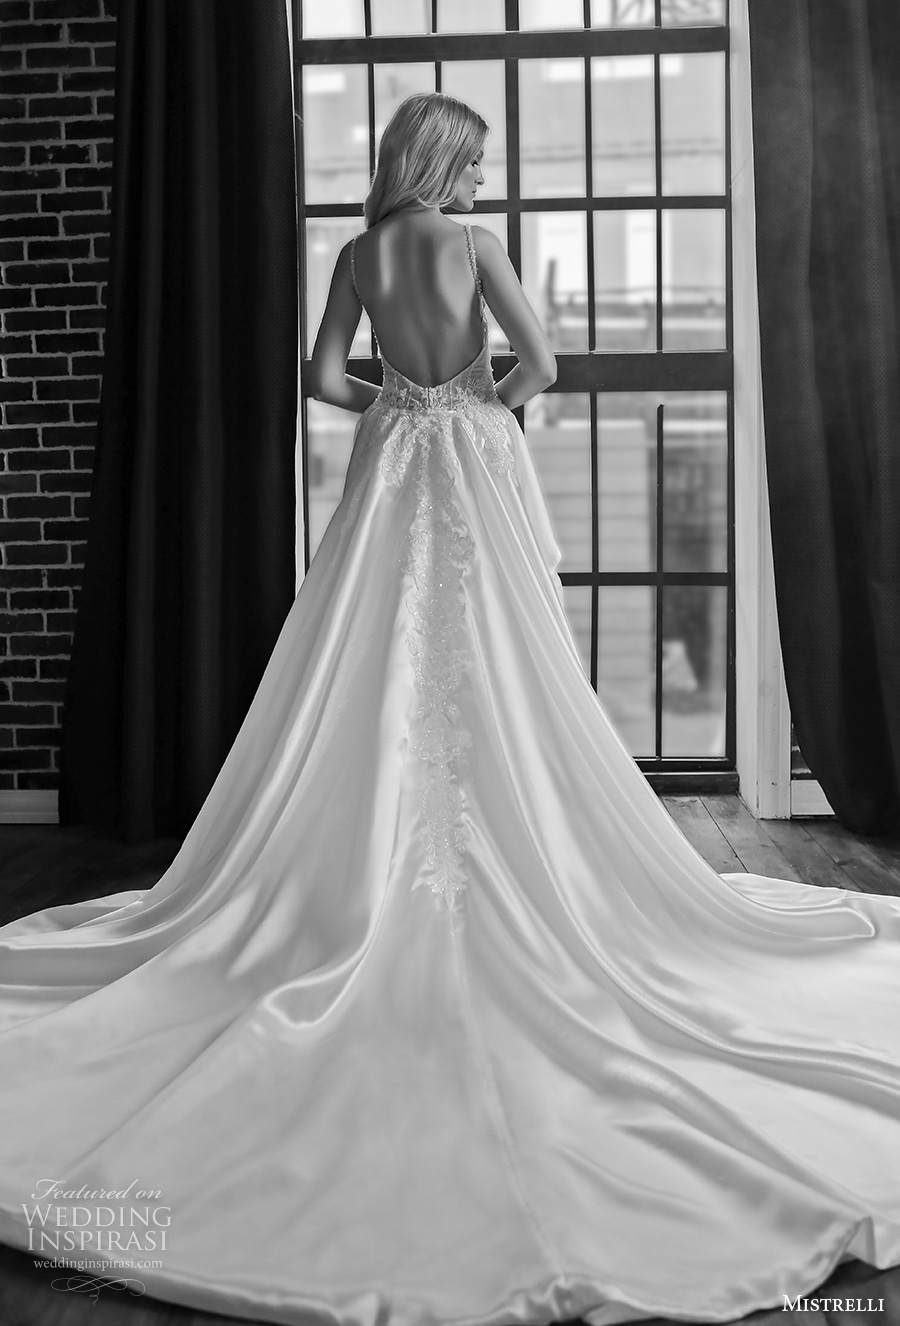 mistrelli 2021 royal drama bridal sleeveless thin strap deep sweetheart neckline full embellishment glamorous sheath wedding dress a  line overskirt backless low back chapel train (9) bv